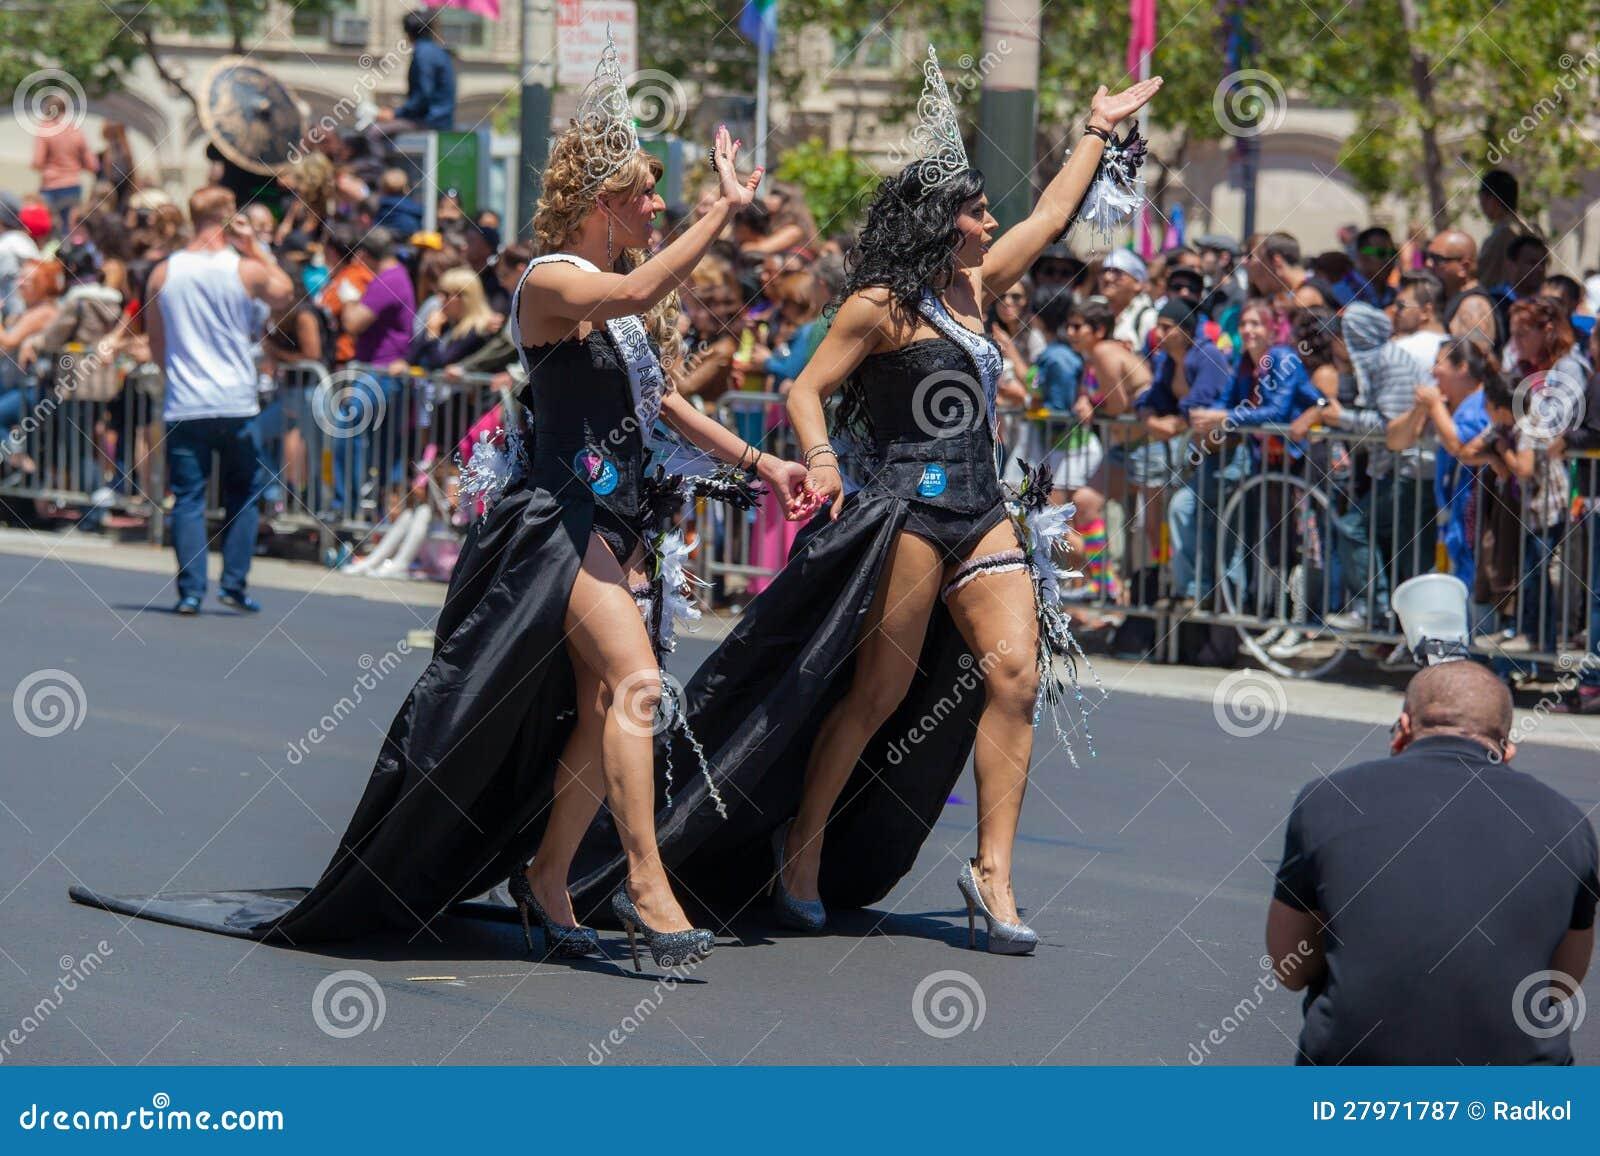 Mathers san francisco transvestite entertainment club